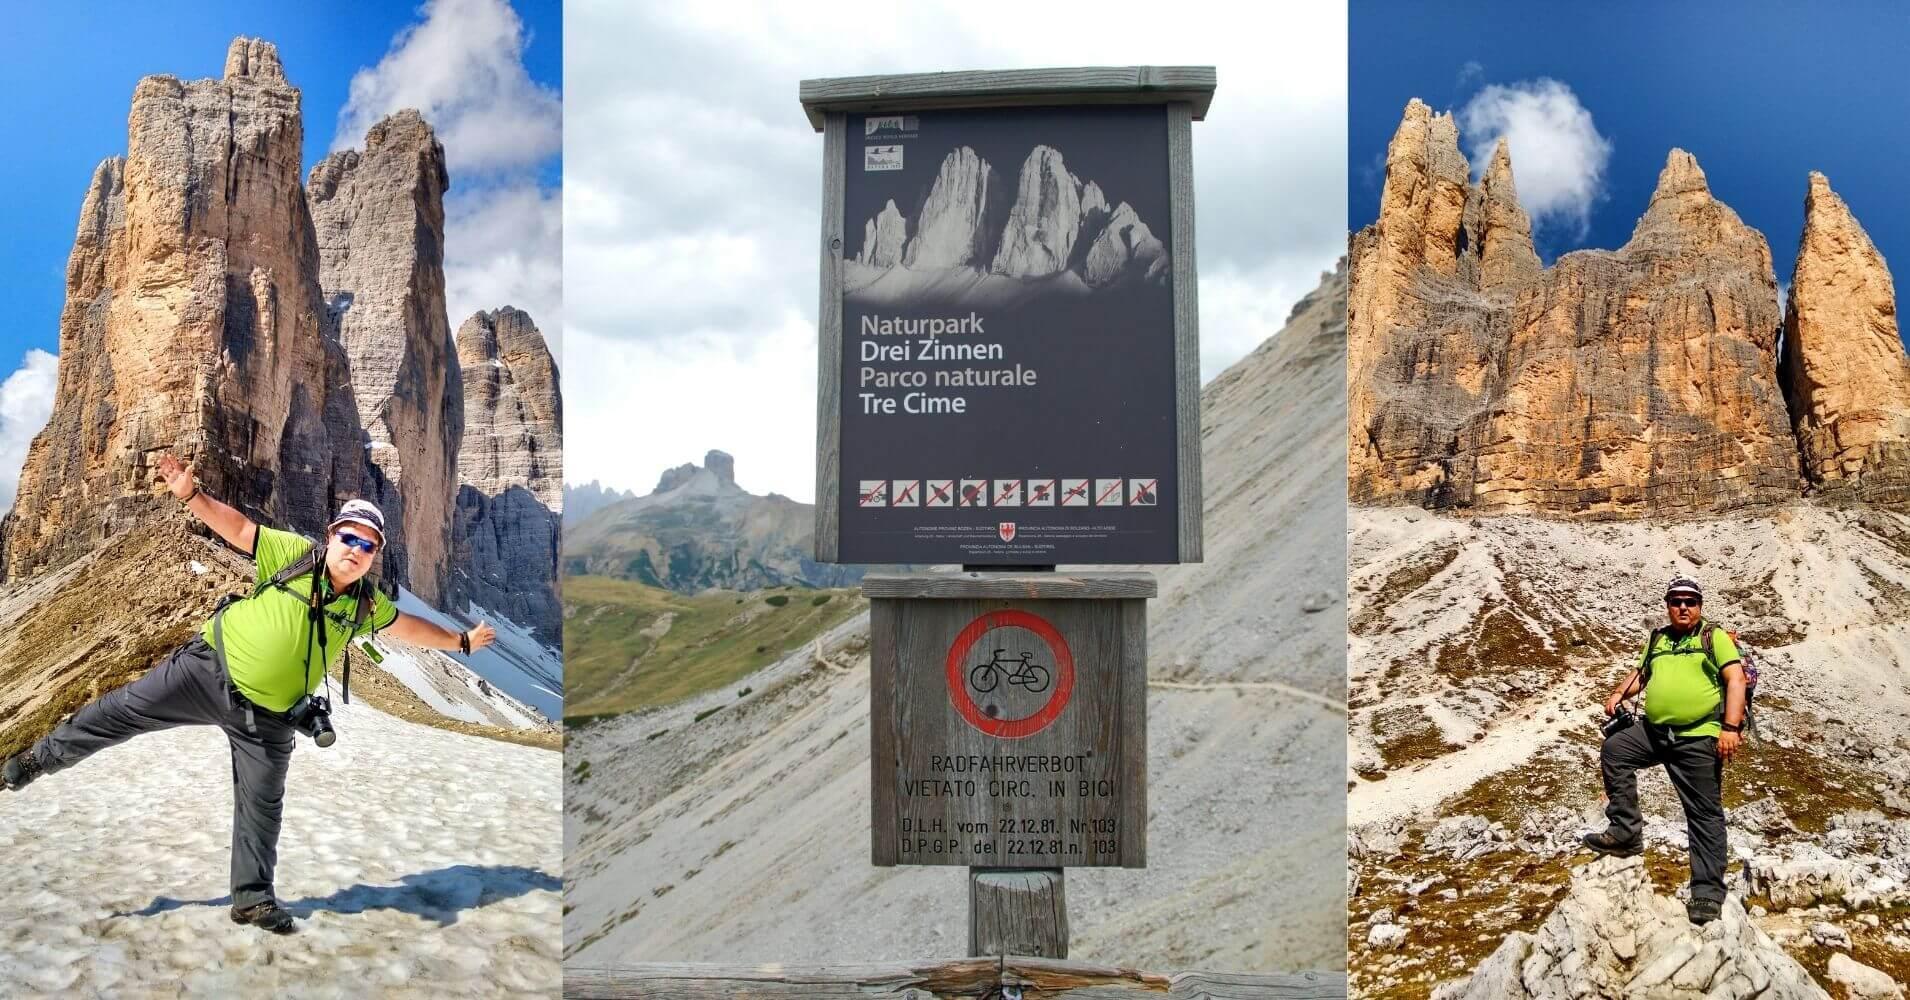 Collado de la Forcella de Lavaredo o Collado Patternsattle. Alpes Dolomitas. Tres Cimas di Lavaredo. Belluno, Véneto. Italia.